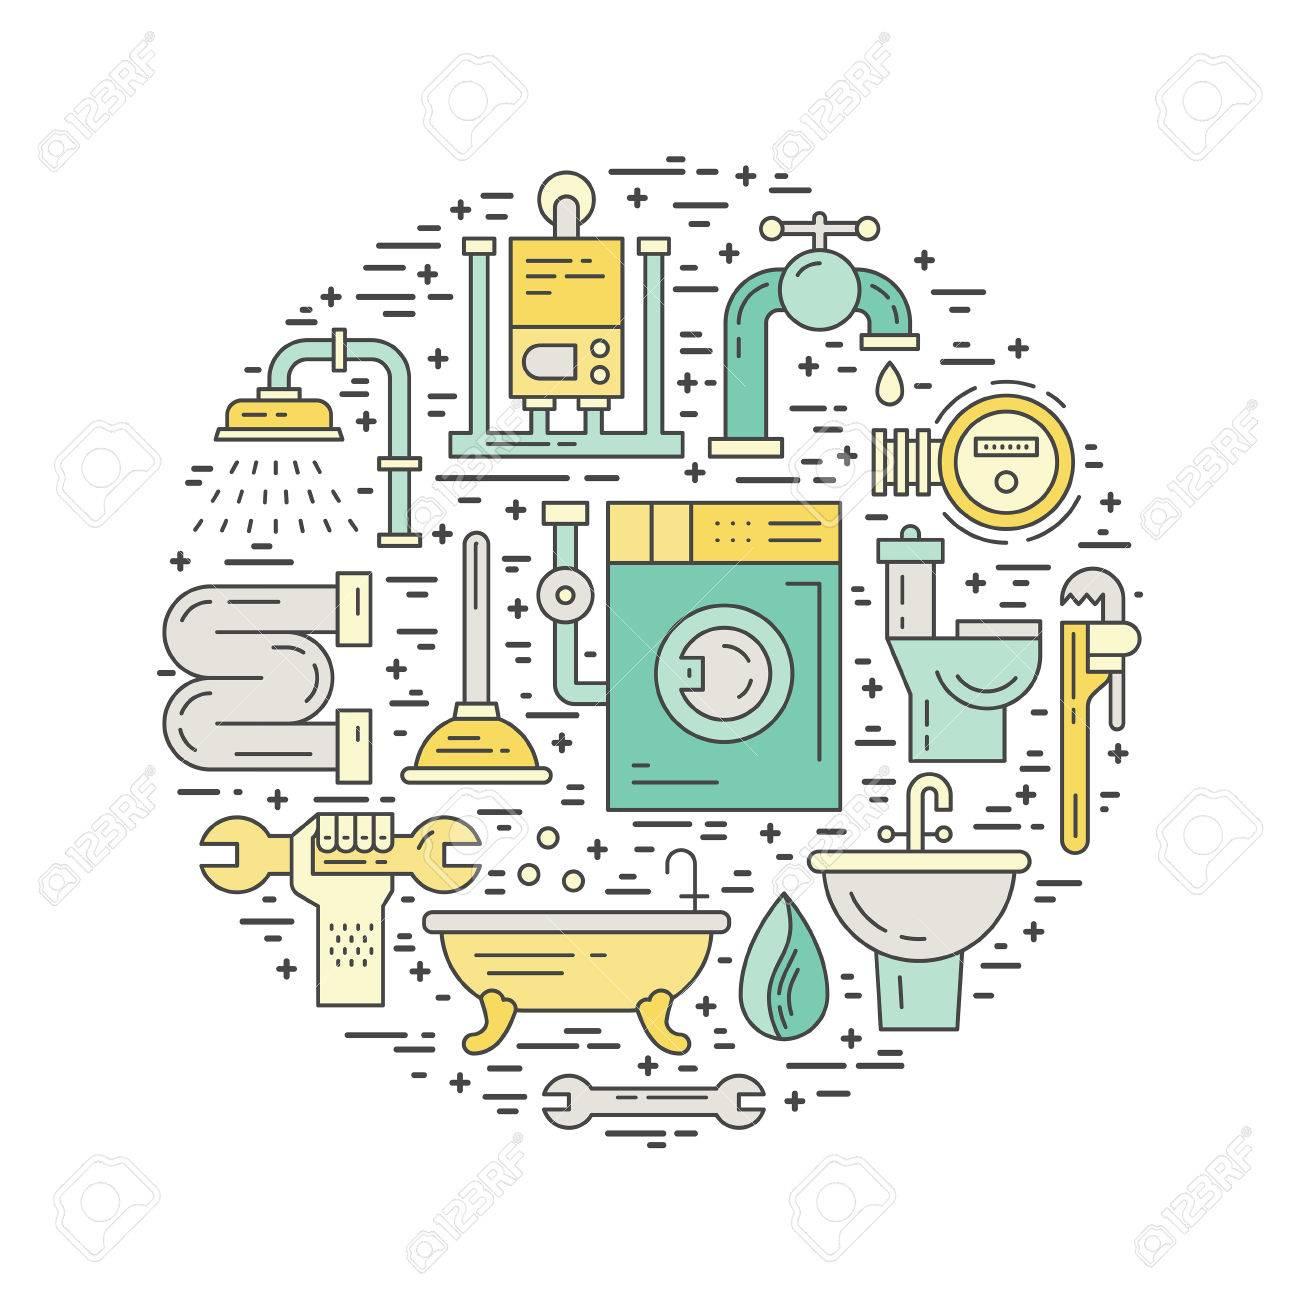 Plumbing Symbols Romeondinez